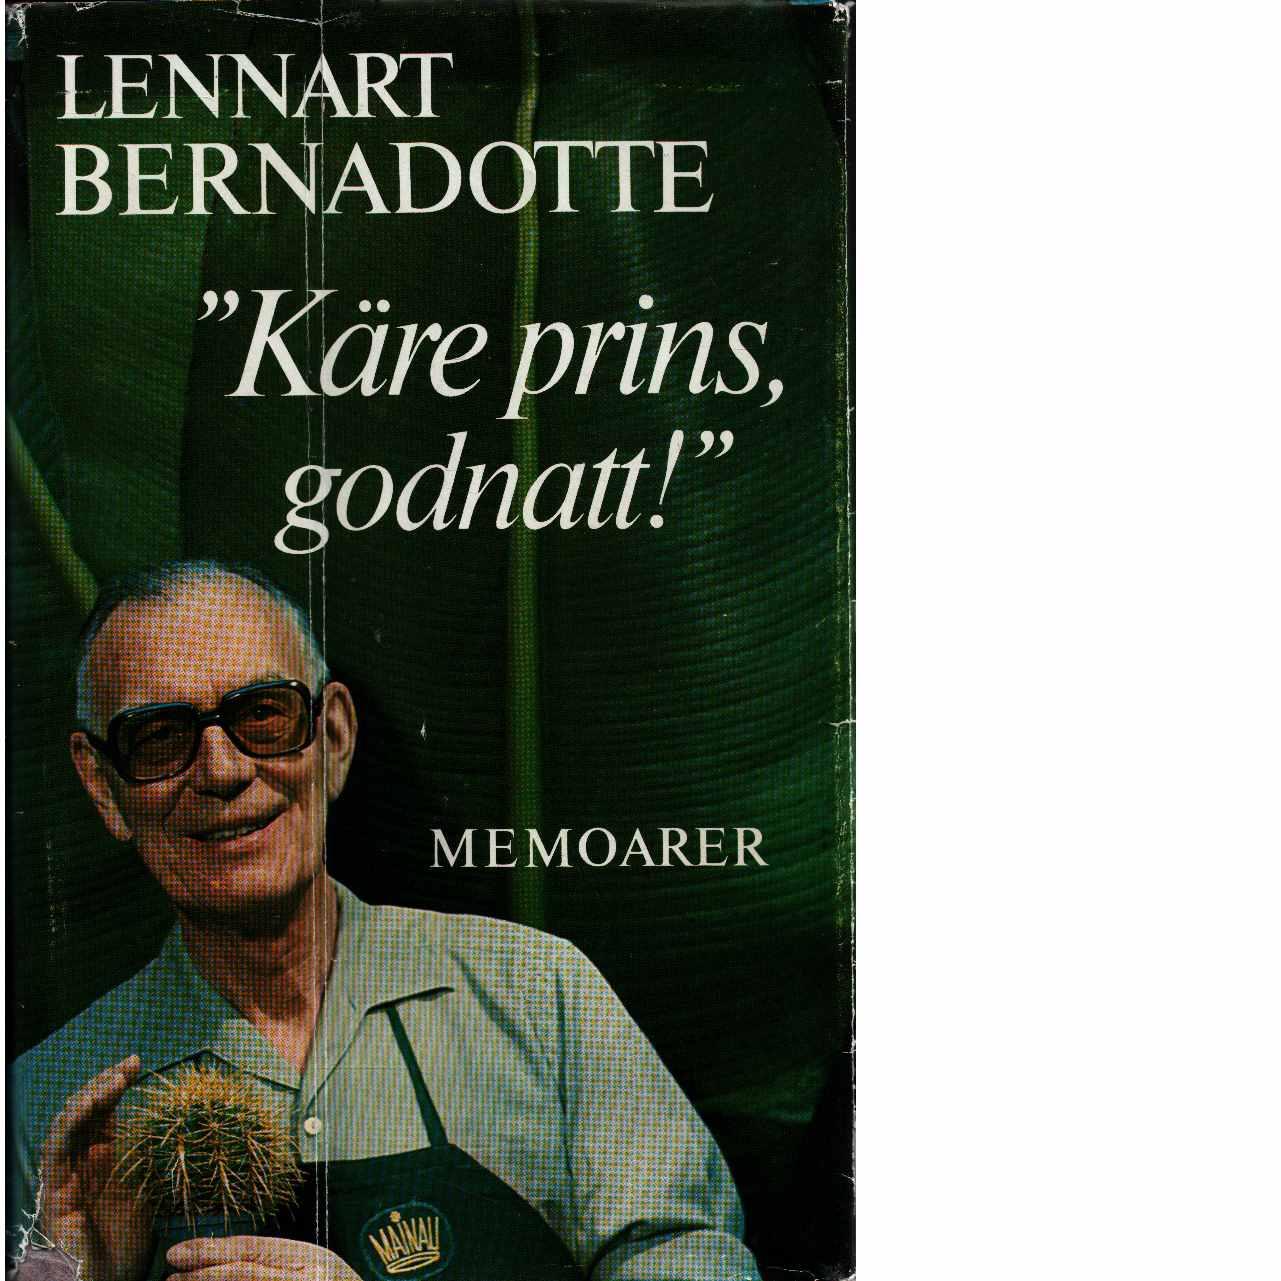 Käre prins, godnatt! : [memoarer] - Bernadotte, Lennart